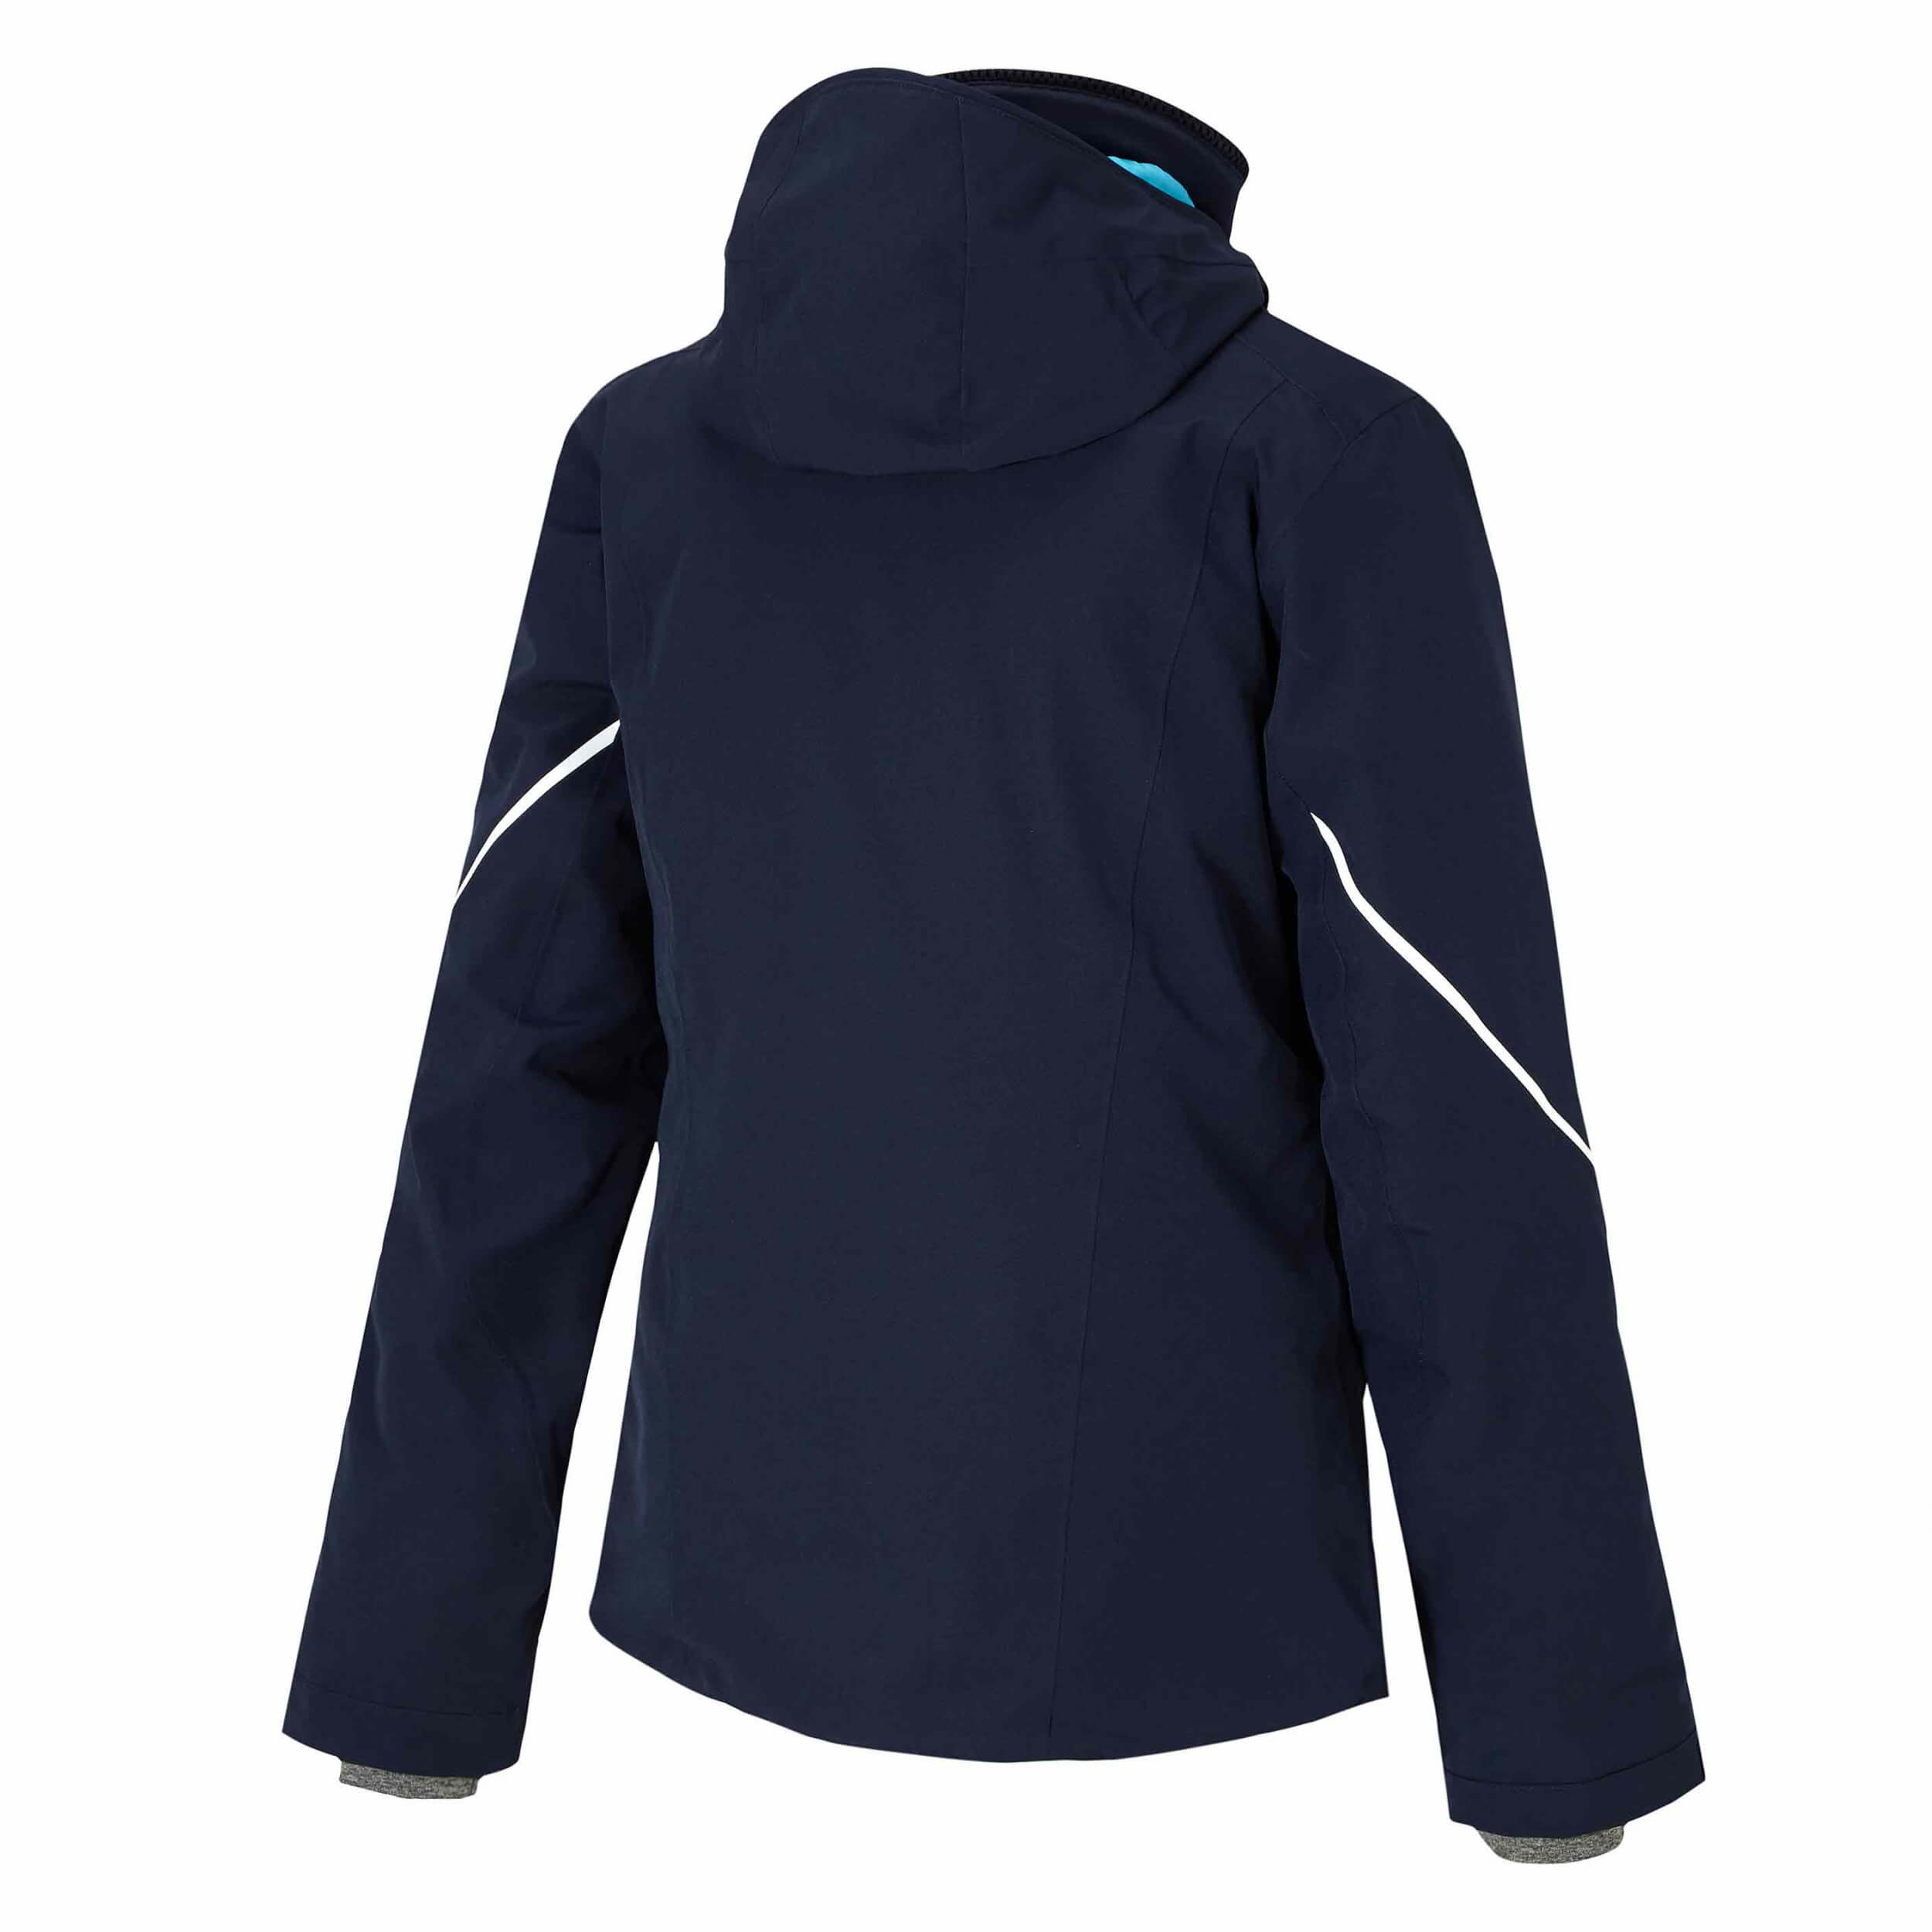 ZIENER Damen Skijacke Tilda blau 964